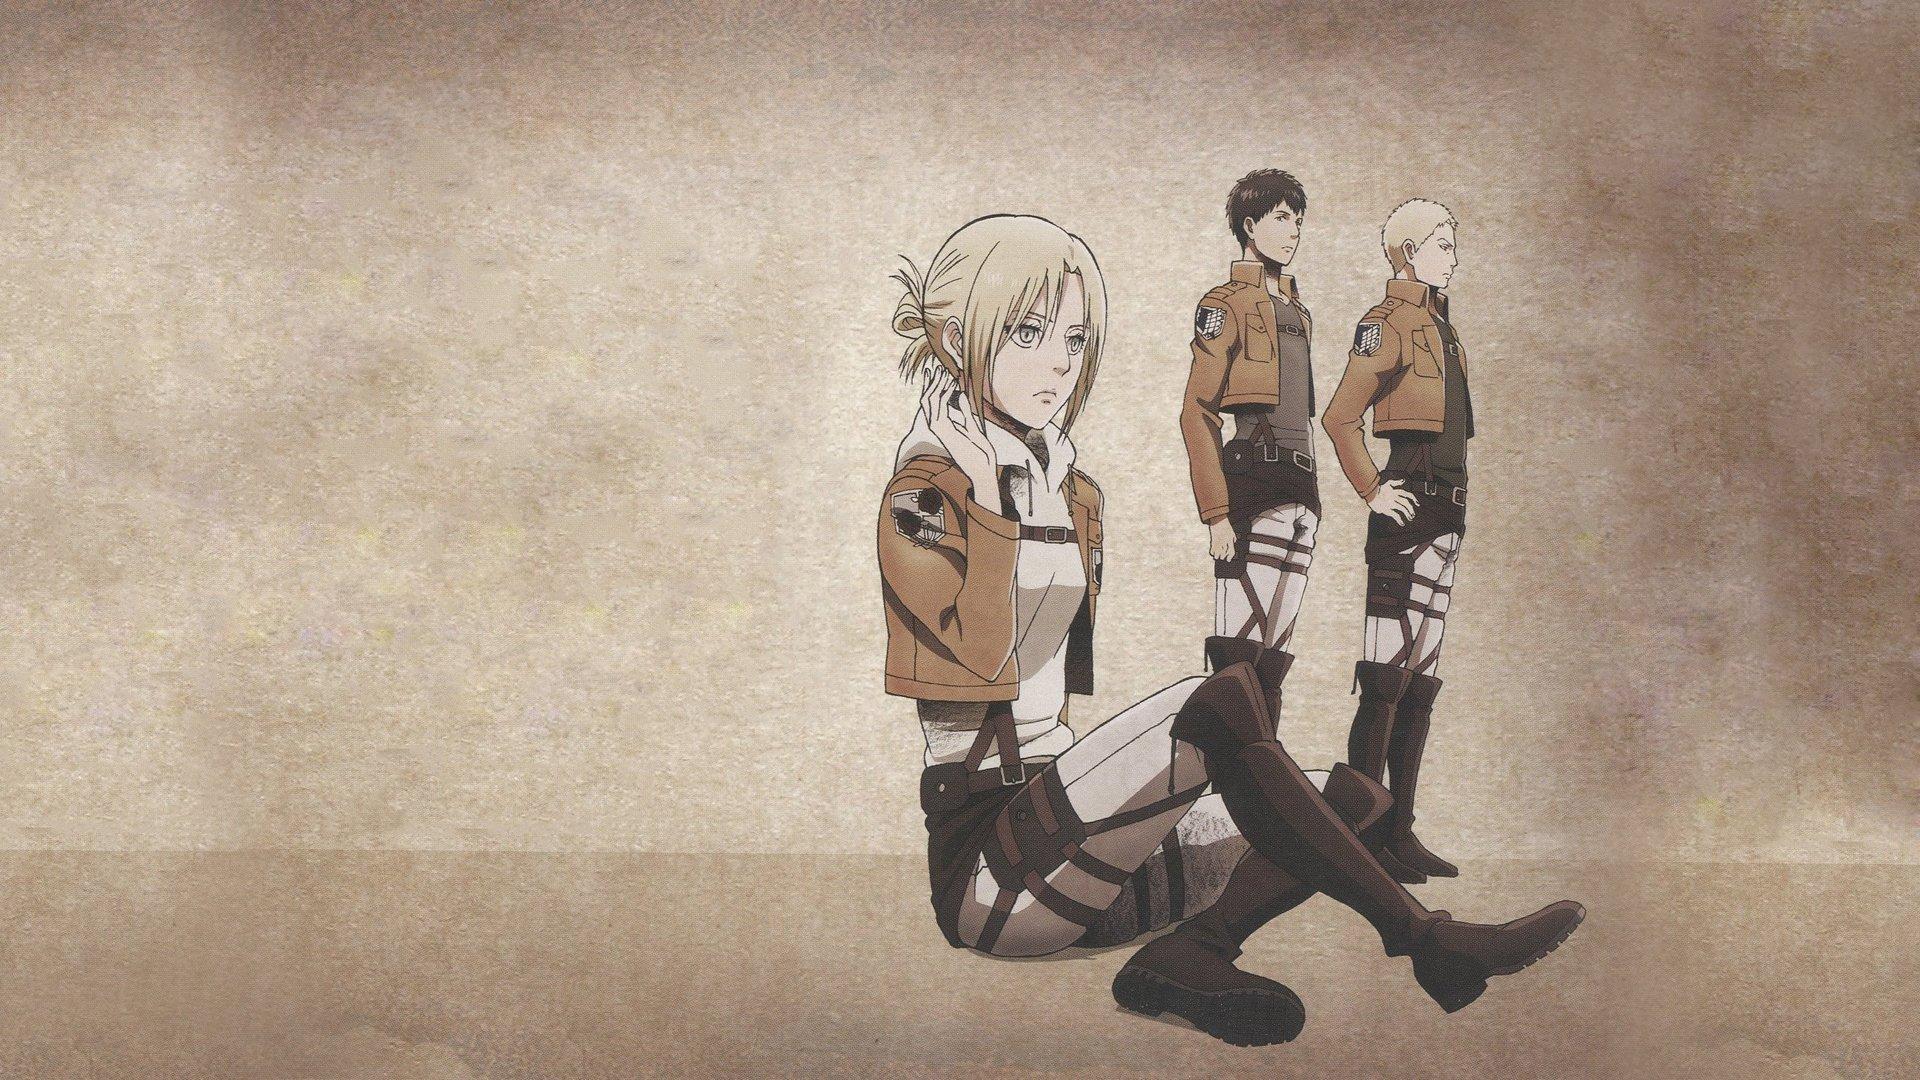 Wallpaper game big anime fight asian giant manga. Attack On Titan HD Wallpaper | Background Image ...